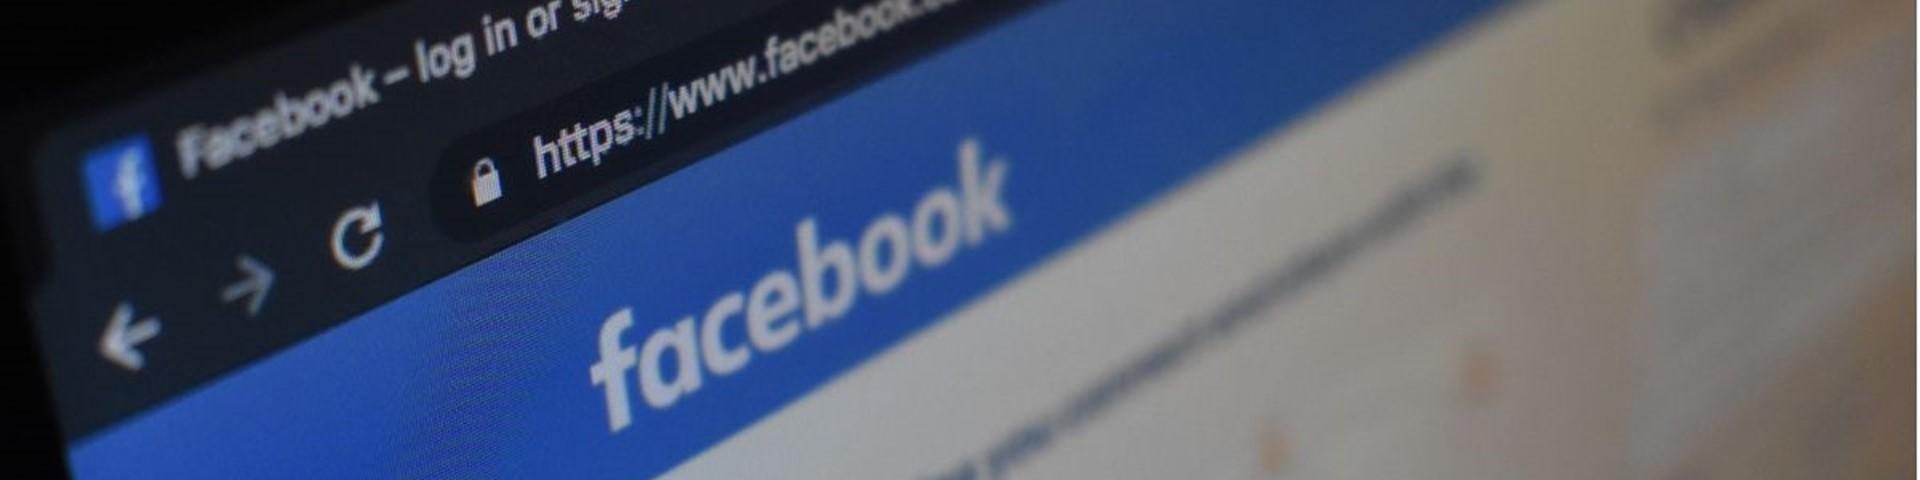 Facebook muda publicidade ligada a produtos e serviços financeiros3 min read